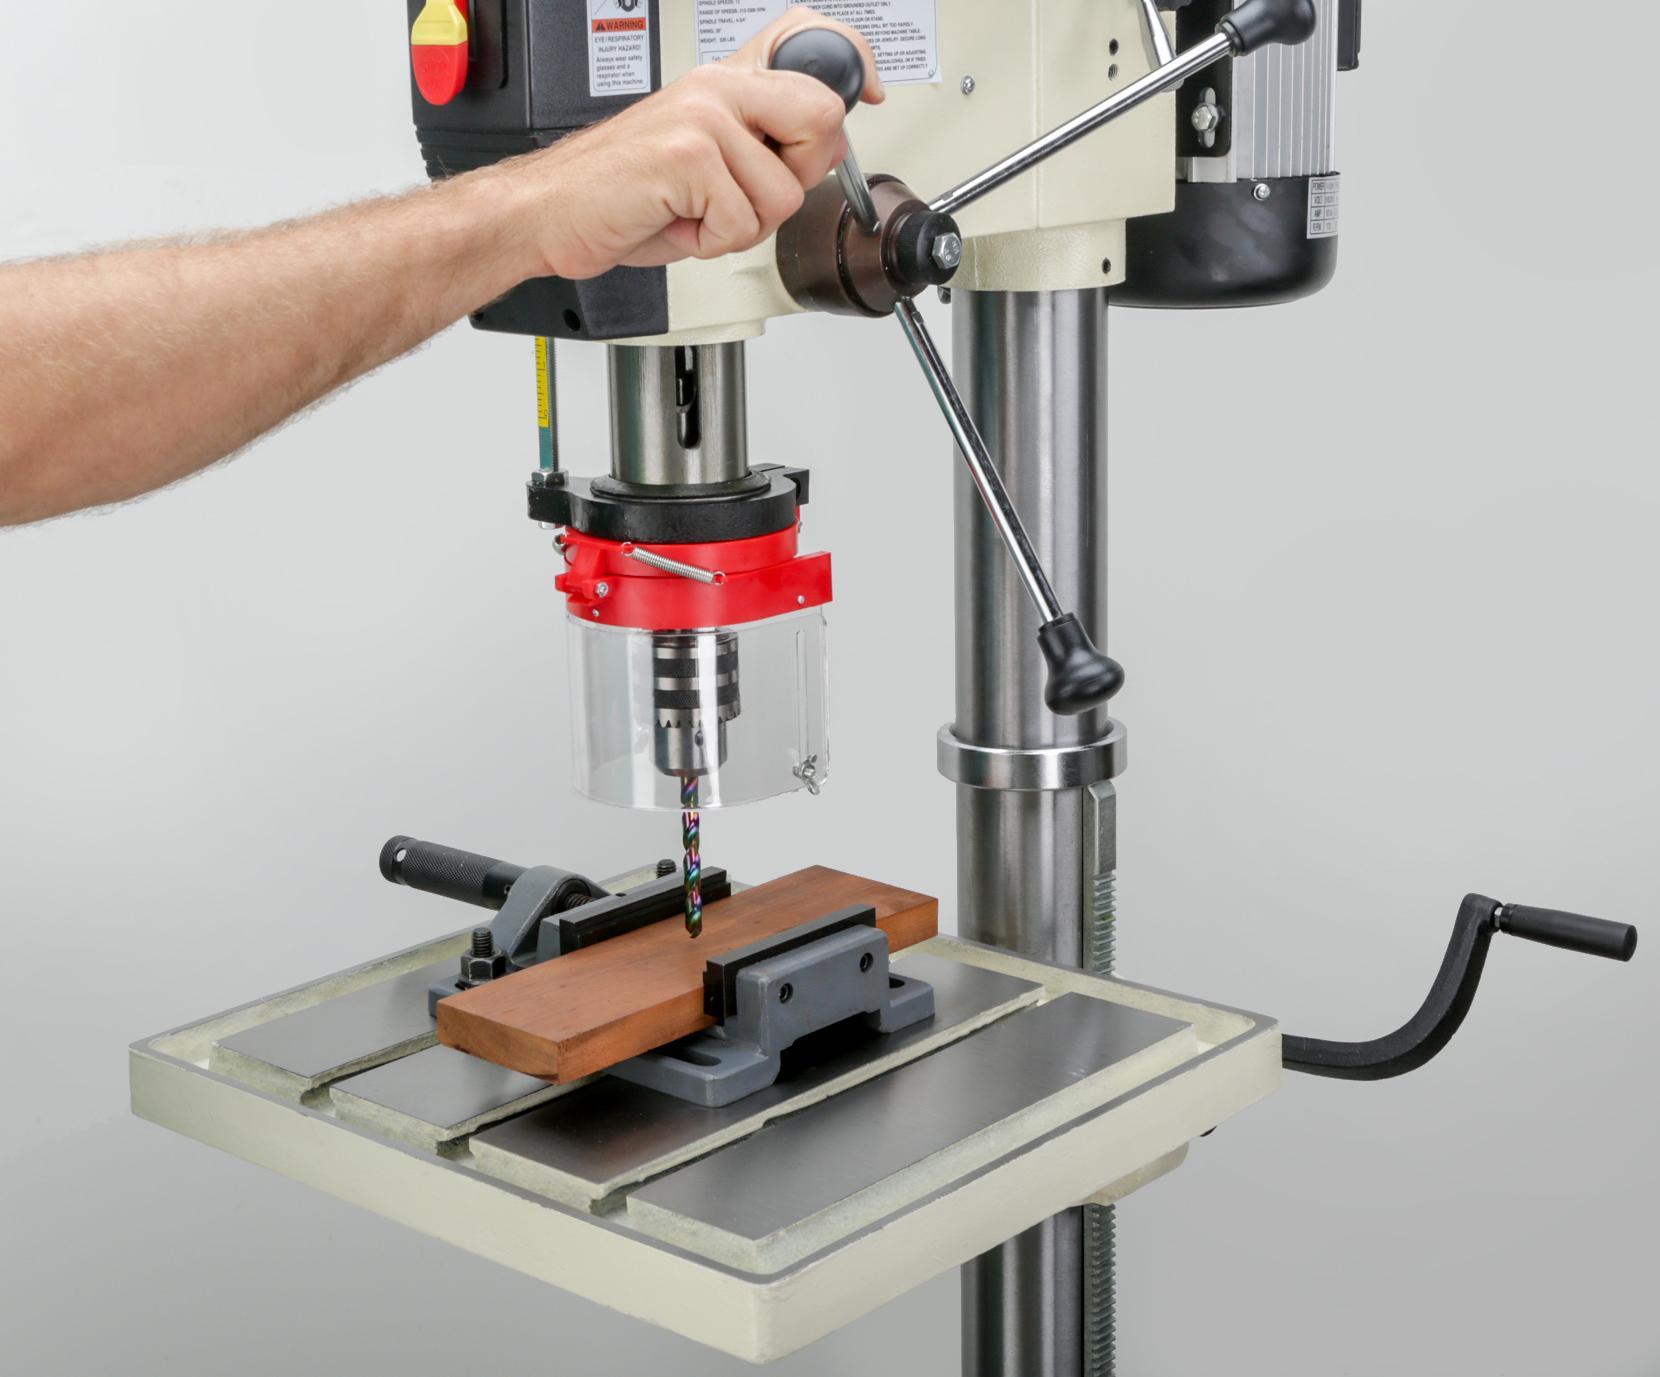 Shop Fox M1039 20 Inch Drill Press Power Stationary Drill Presses